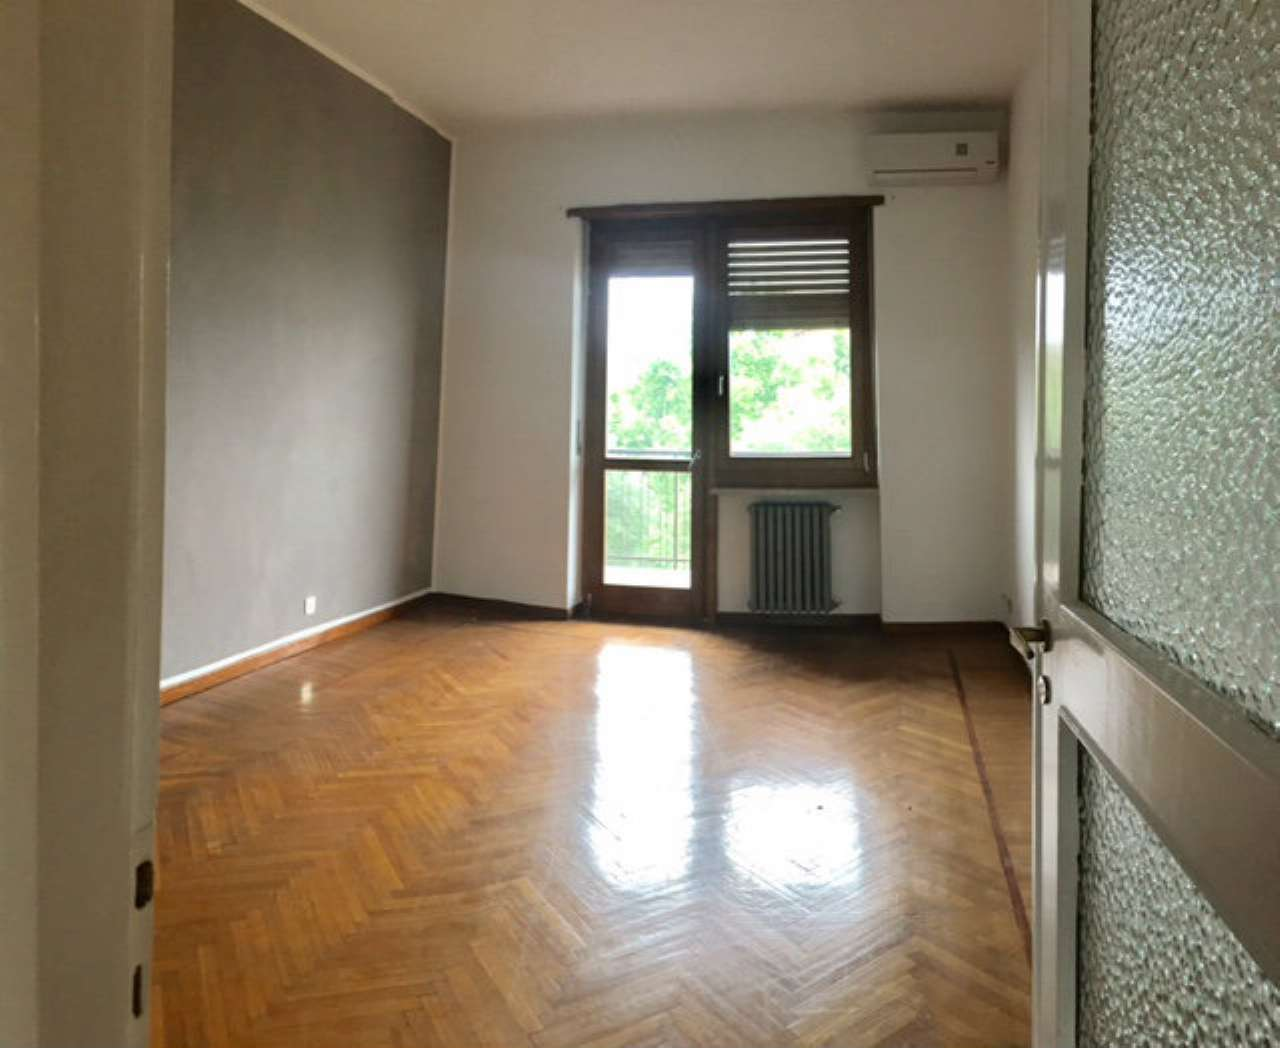 Foto 9 di Appartamento via Arnaldo da Brescia, Torino (zona Lingotto)